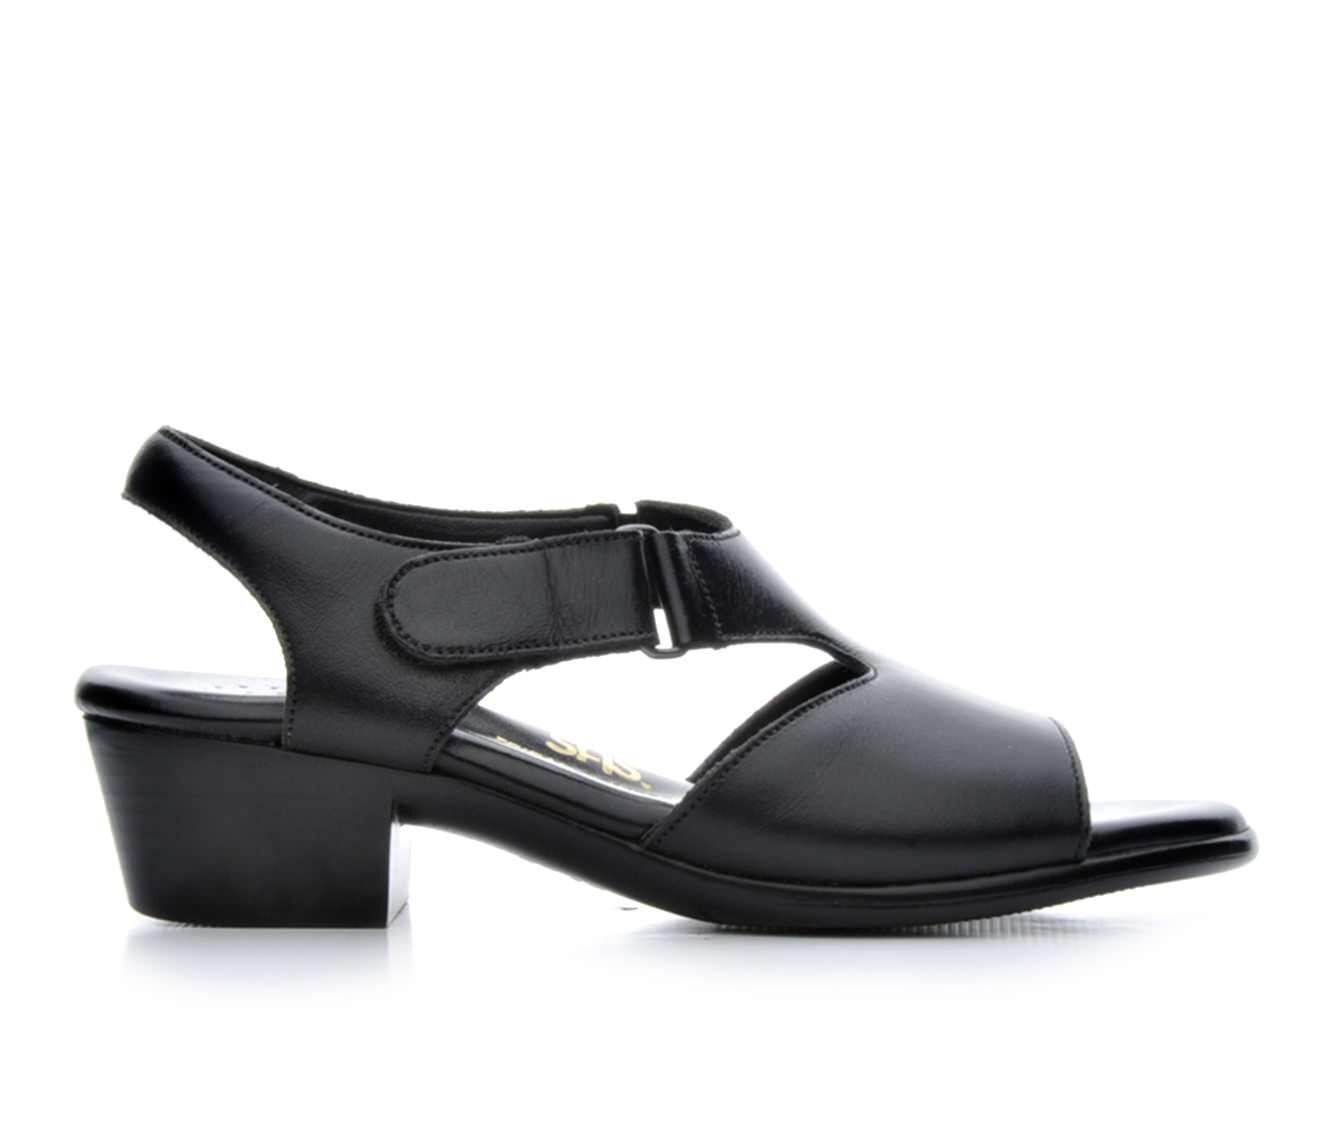 uk shoes_kd5745